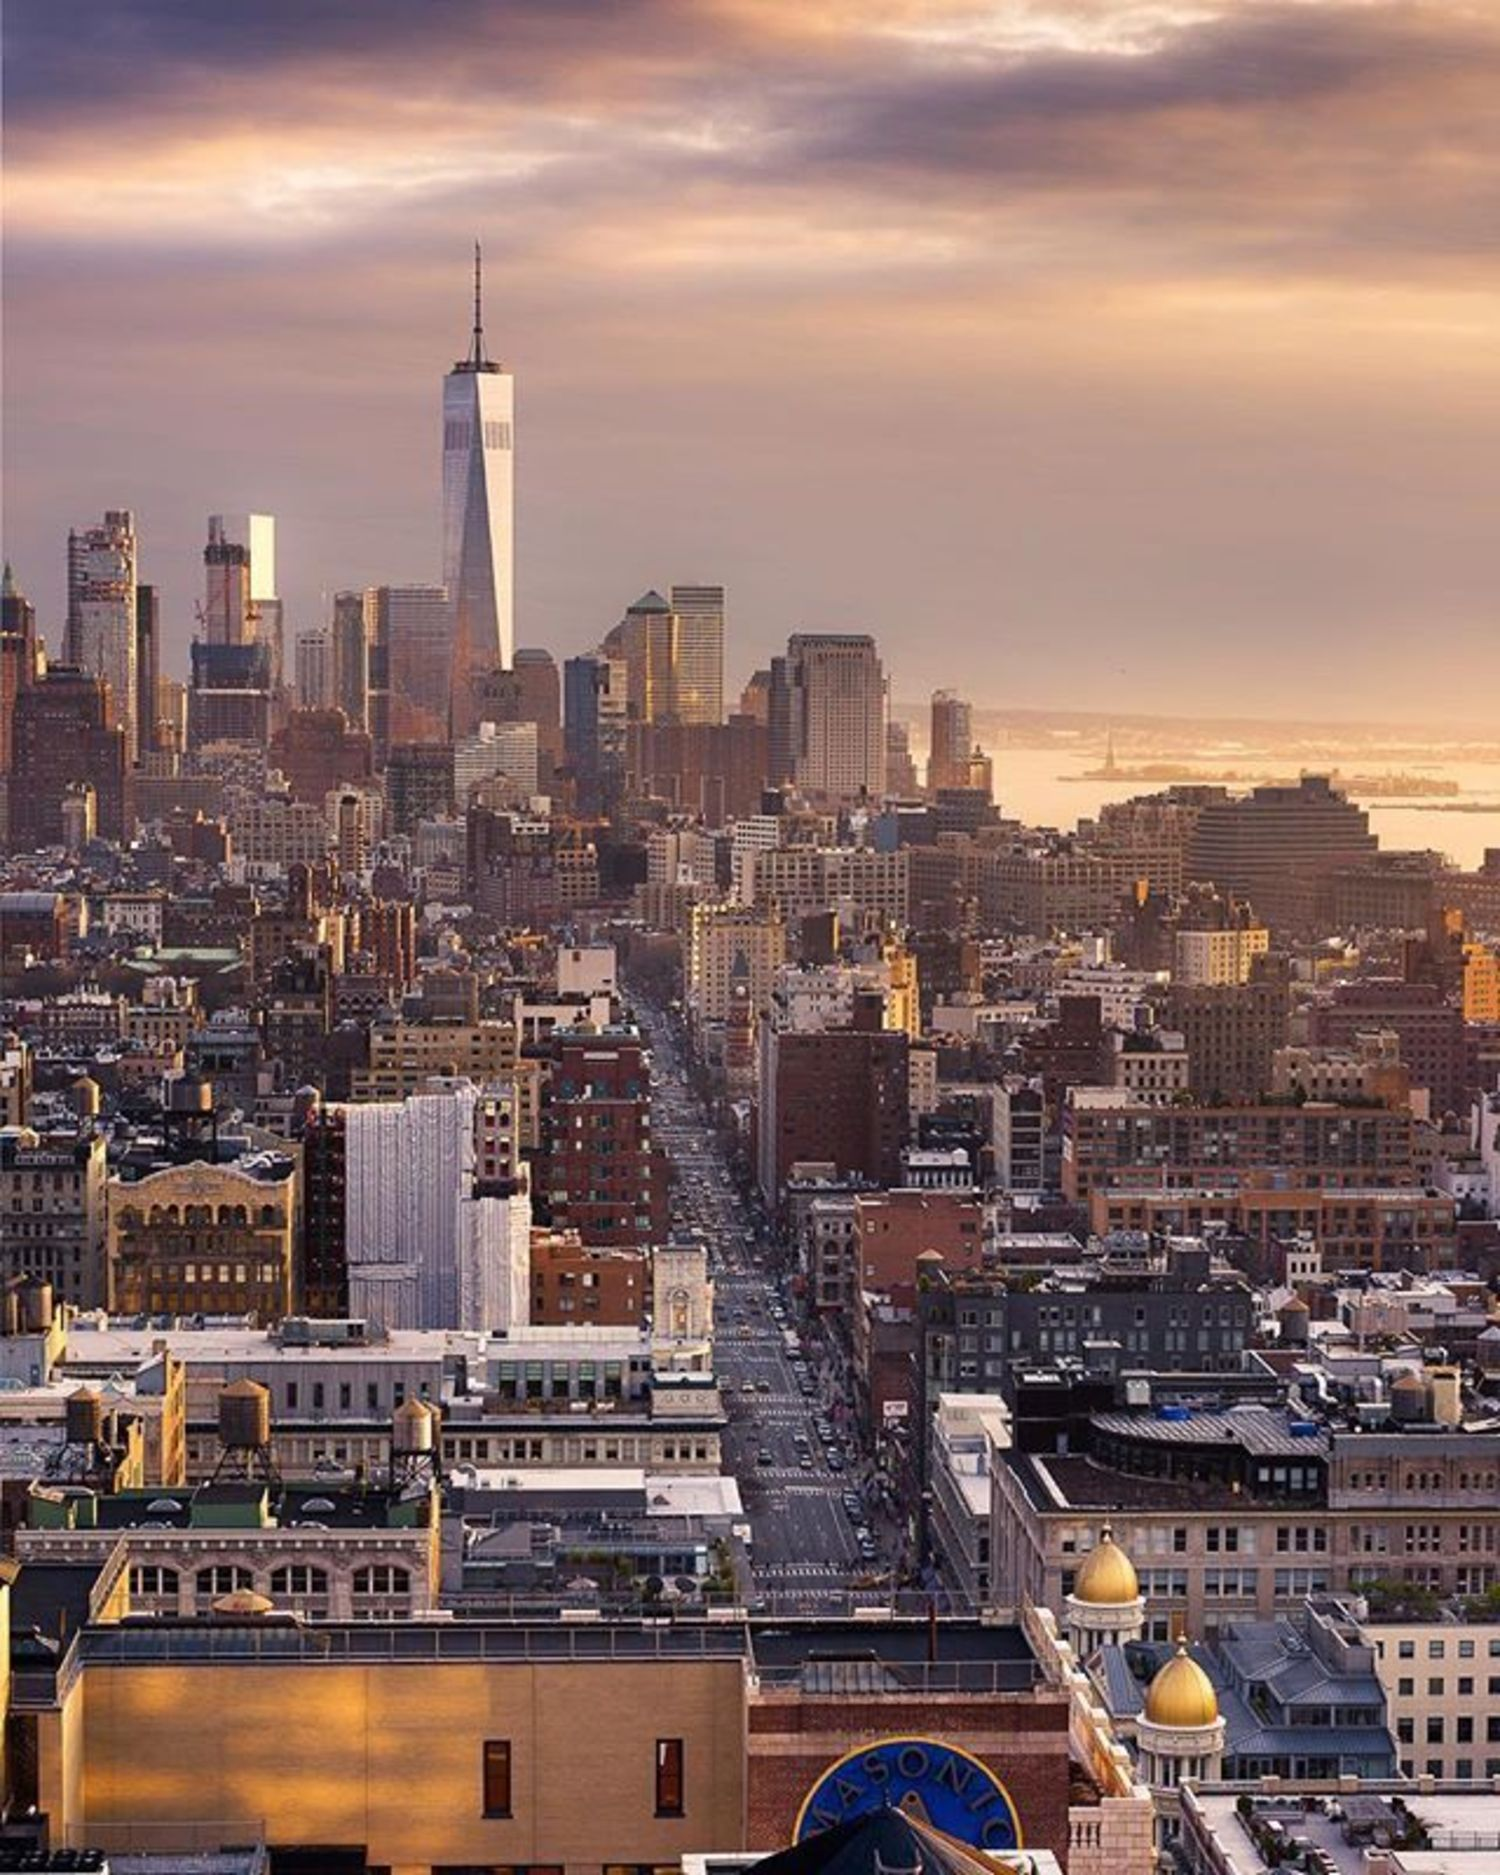 New York, New York. Photo via @kirit143 #viewingnyc #newyork #newyork #newyorkcity #nyc